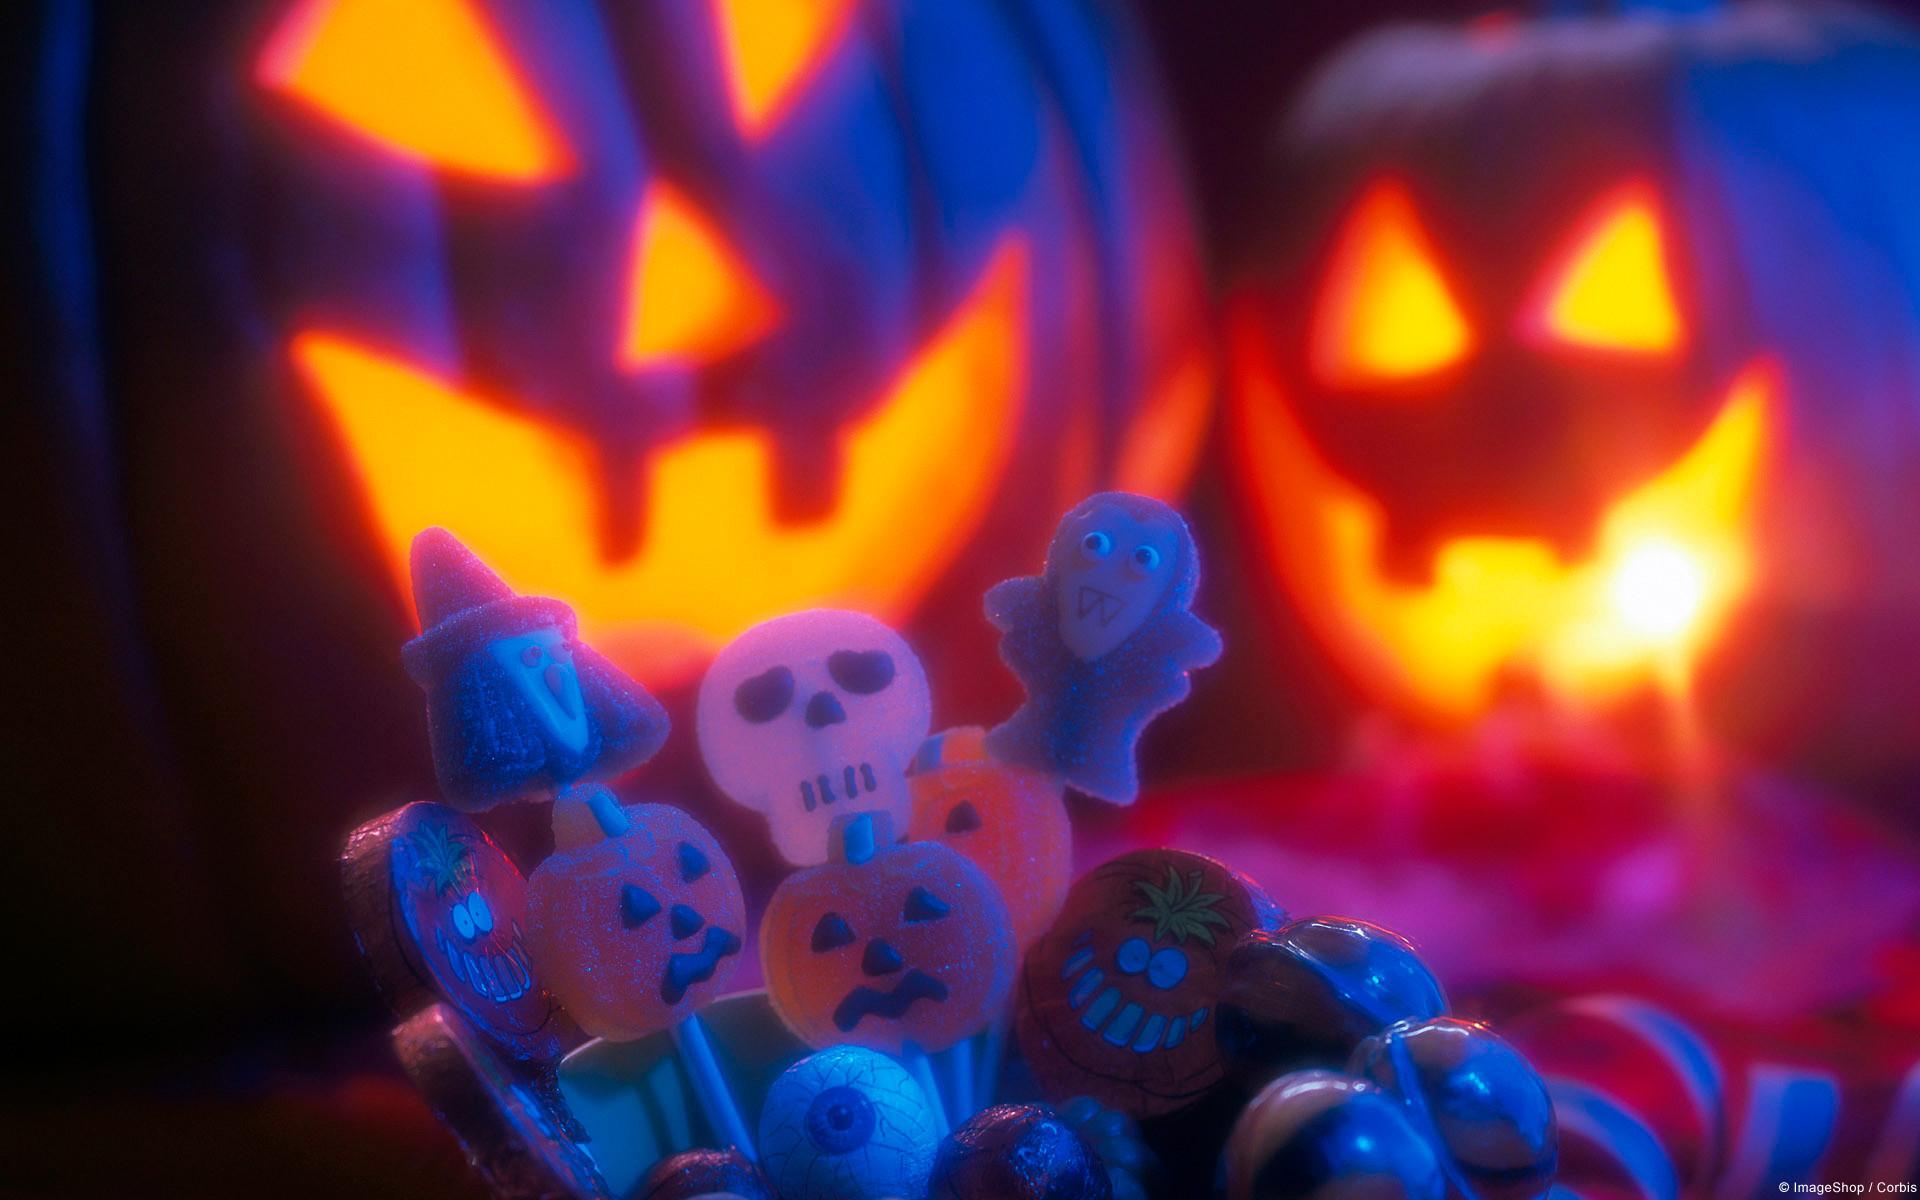 … Halloween Wallpapers For Windows 7 (18)